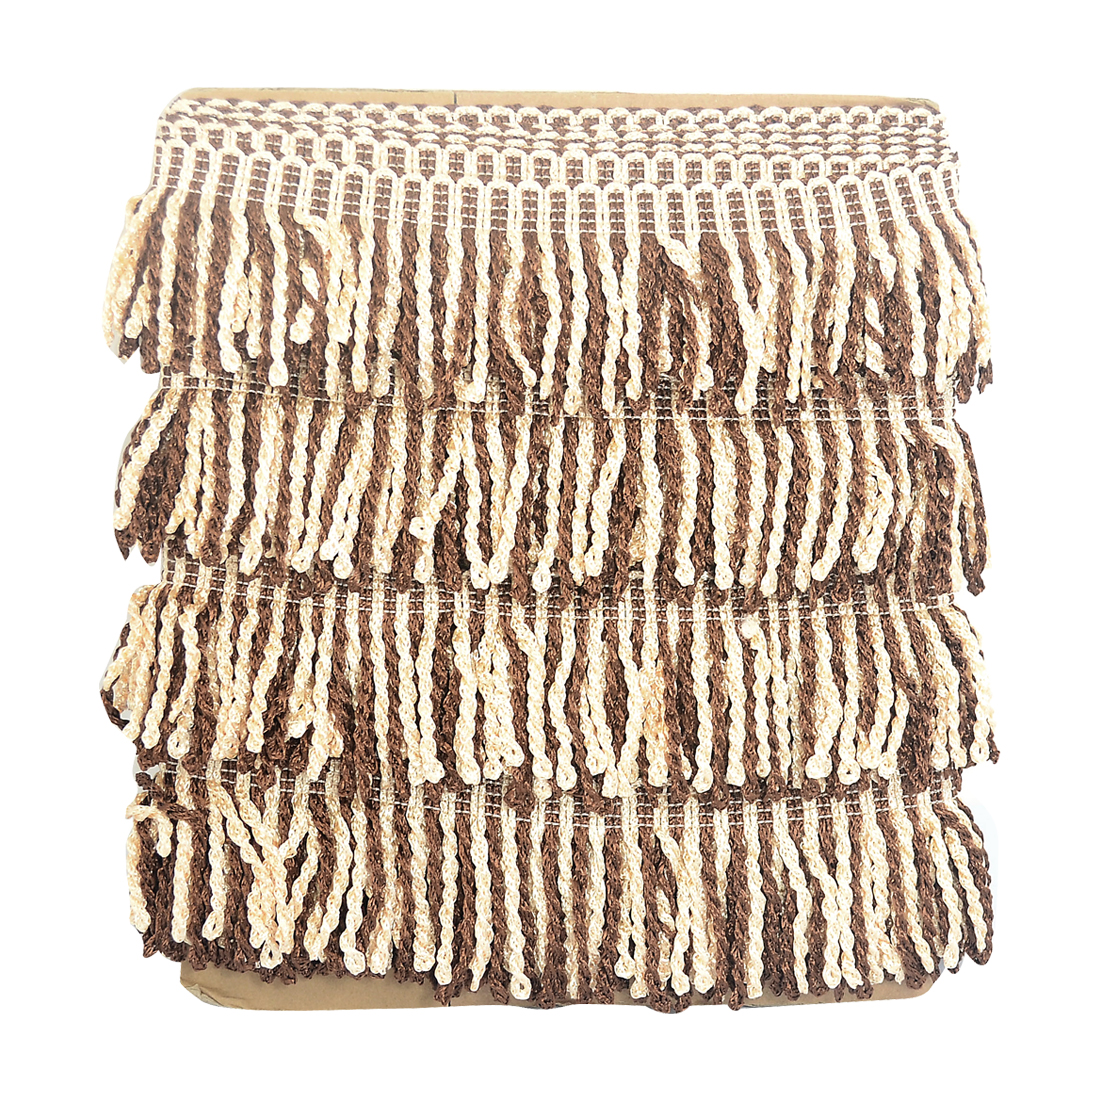 12M Curtain Trimming Edging Tassel Fringe Trim DIY Drapery Brown Beige